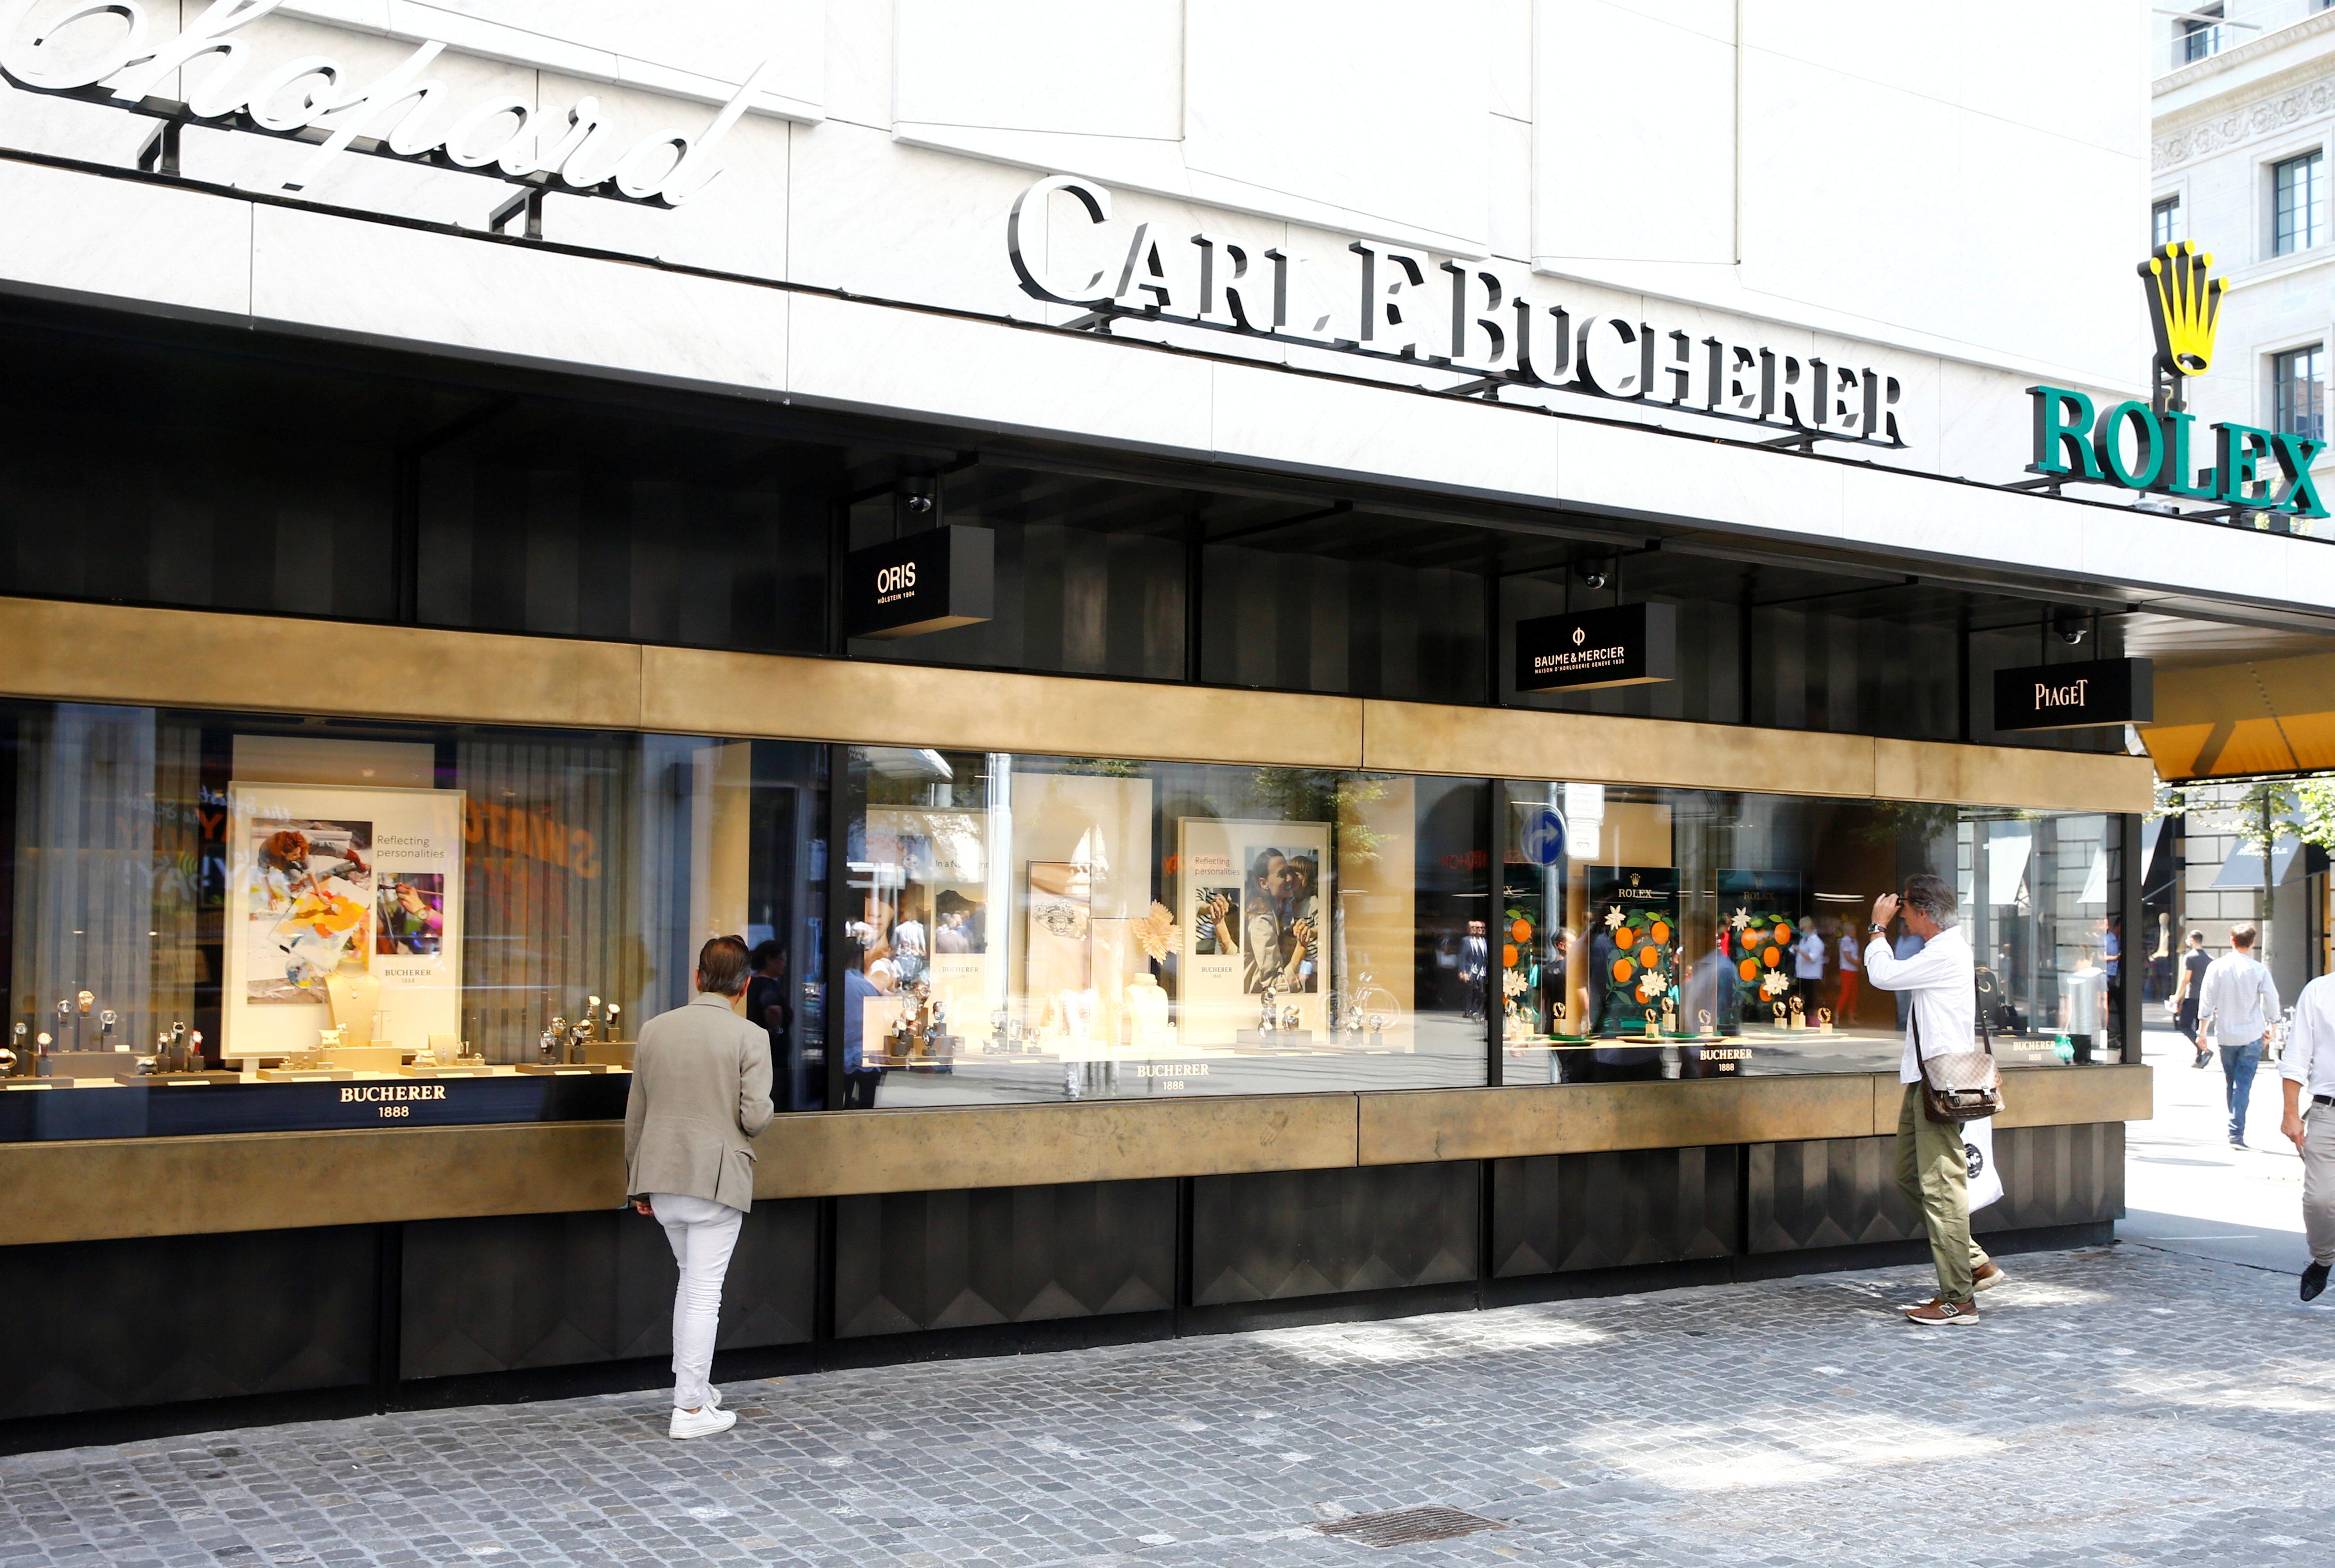 A Bucherer watch and jewellery shop is seen at the Bahnhofstrasse shopping street in Zurich, Switzerland August 12, 2020.   REUTERS/Arnd Wiegmann/File Photo